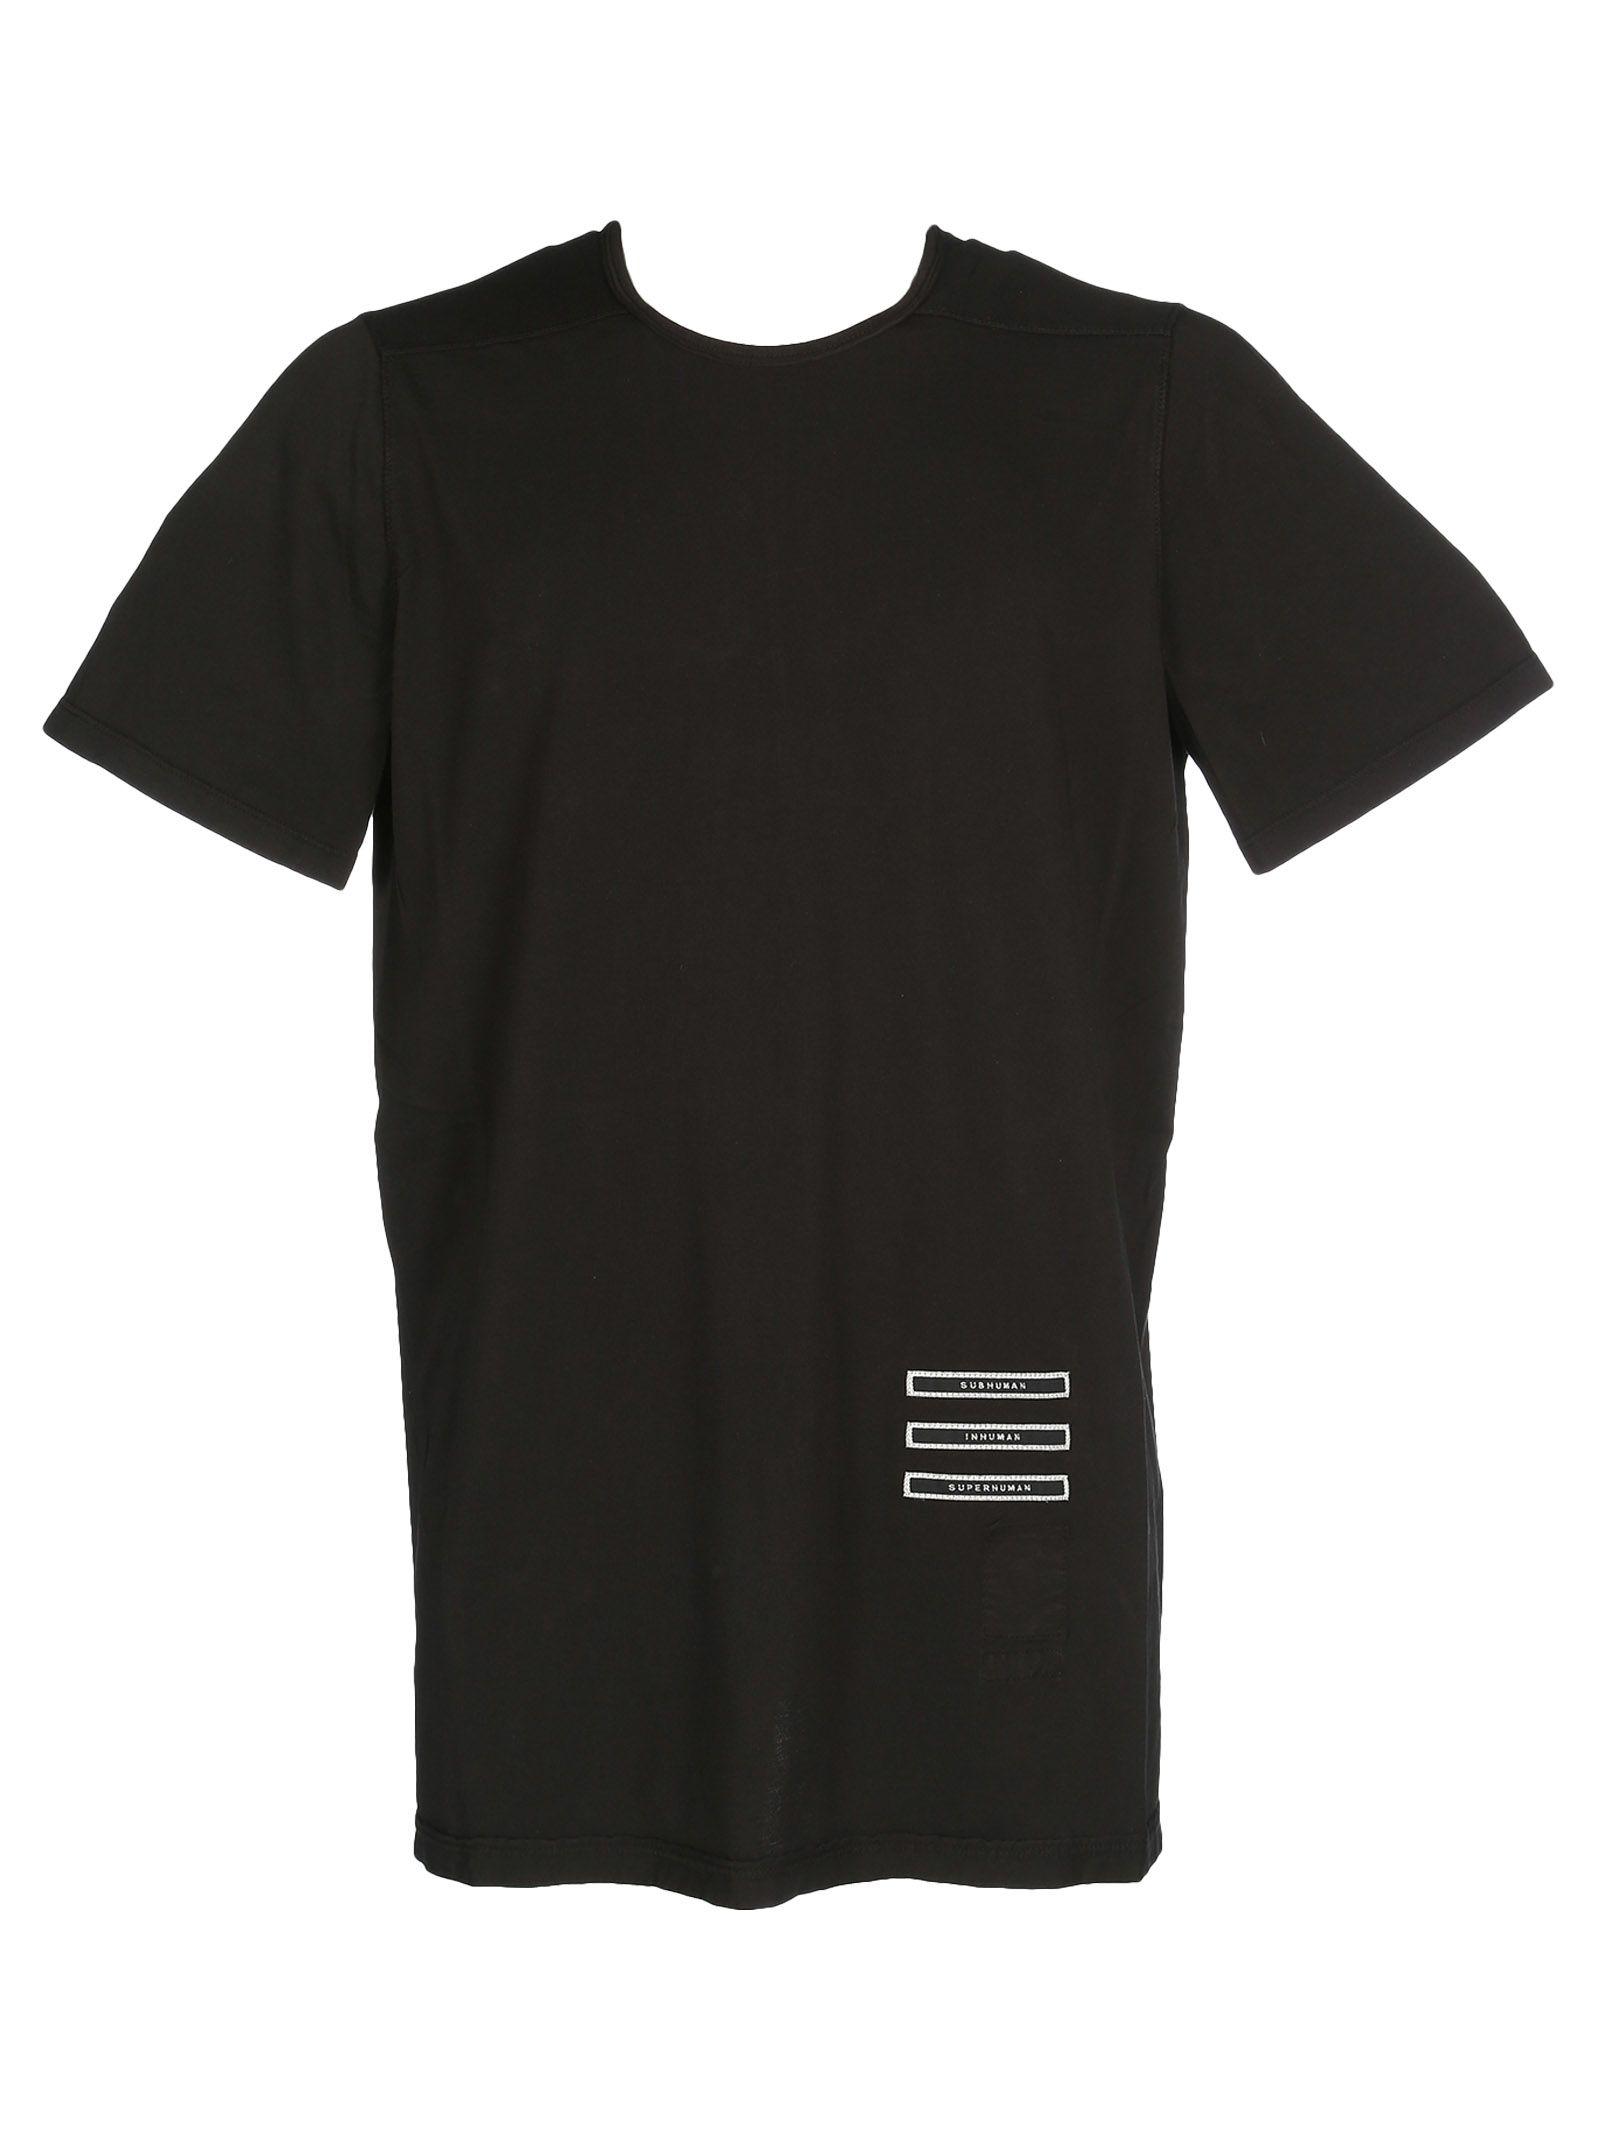 Rick Owens Drkshdw Subhuman T-shirt